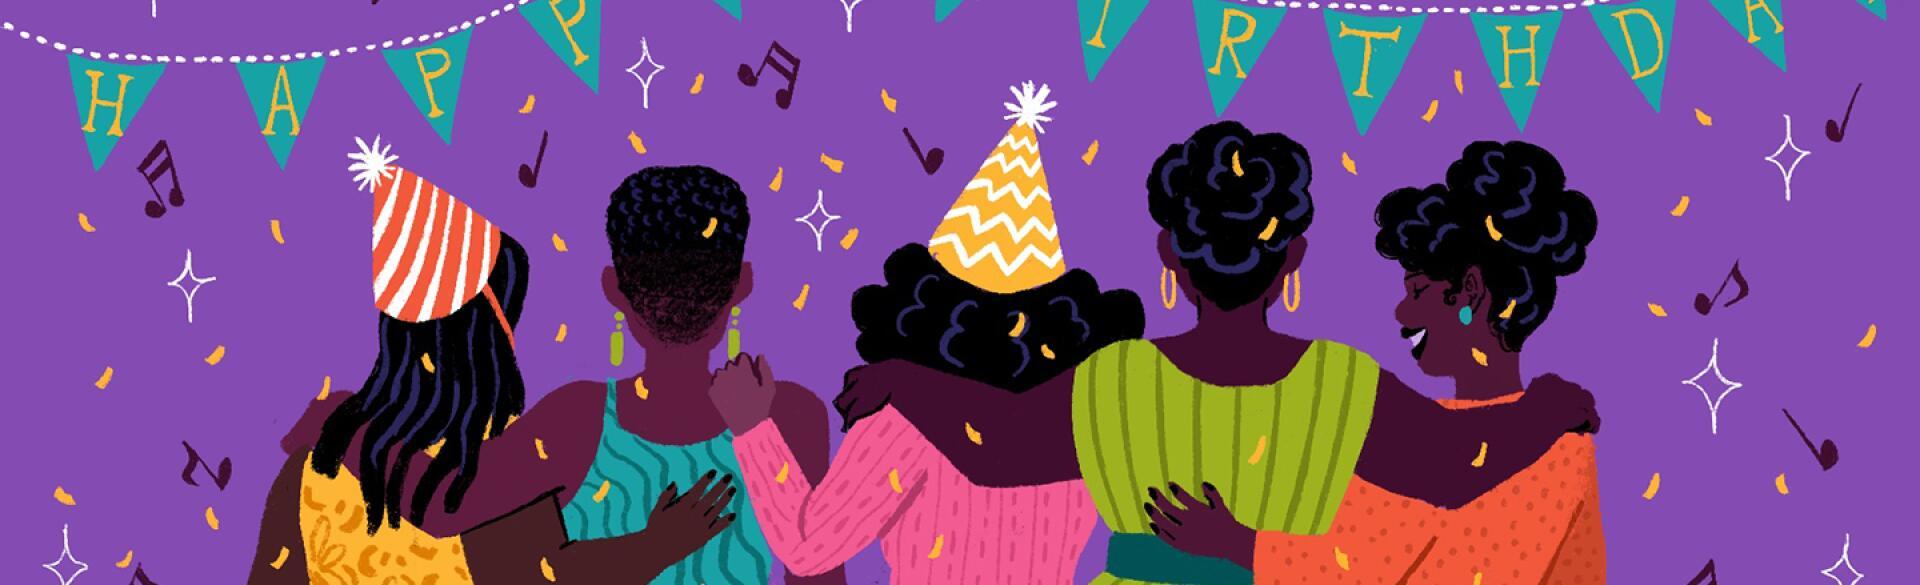 illustration_of_happy_birthday_banner_with_ladies_celebrating_playlist_by_charlot_kristensen_1440x584.jpg